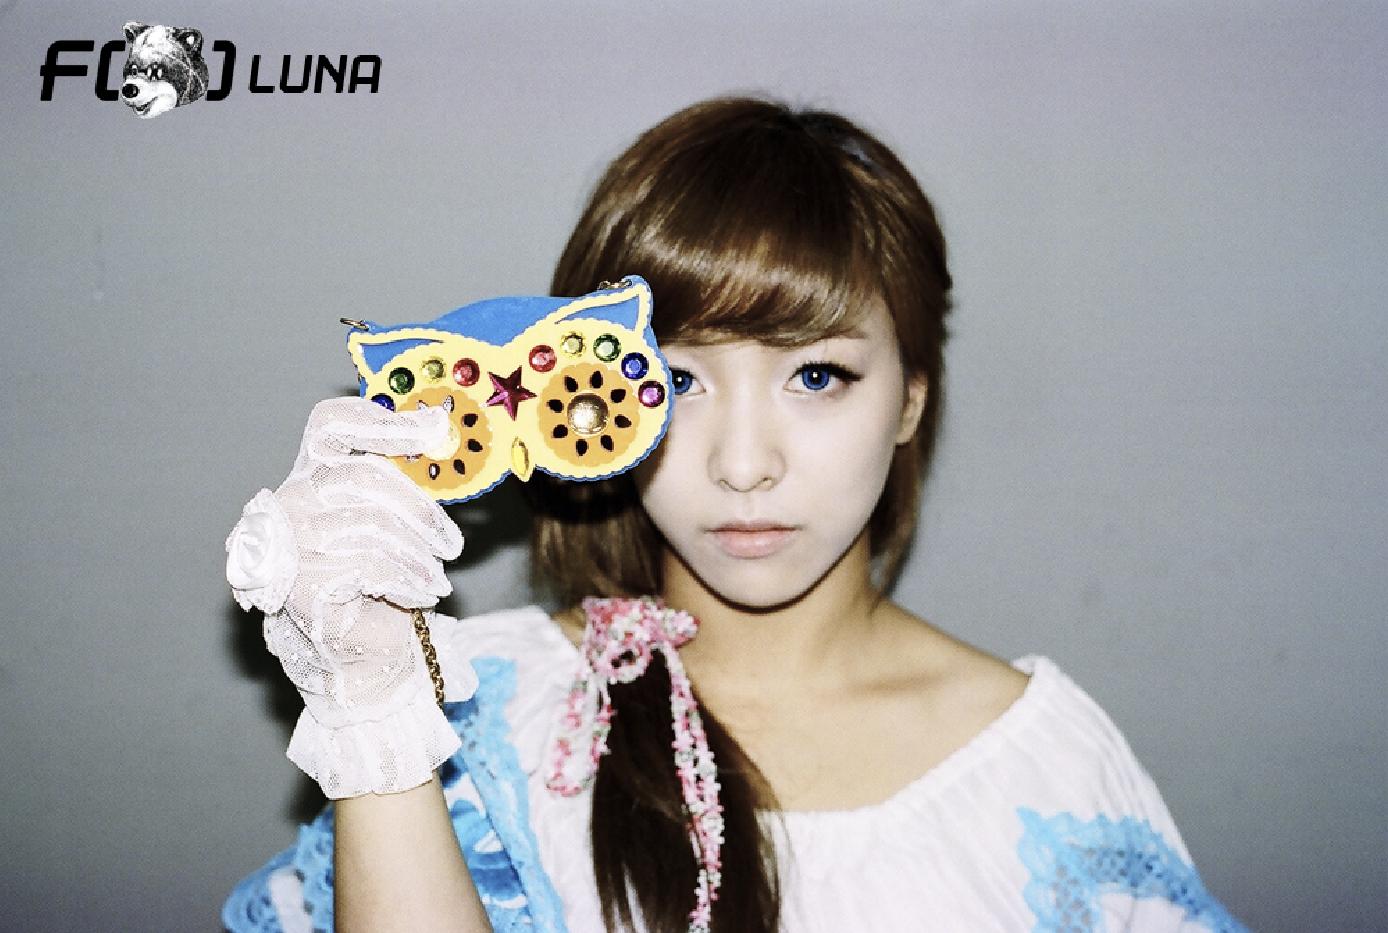 http://1.bp.blogspot.com/-kuAXedVnAcQ/T9aUxXFynwI/AAAAAAAAmxo/ganxAyRzd08/s1600/f(x)+Luna+Electric+Shock+Picture.png